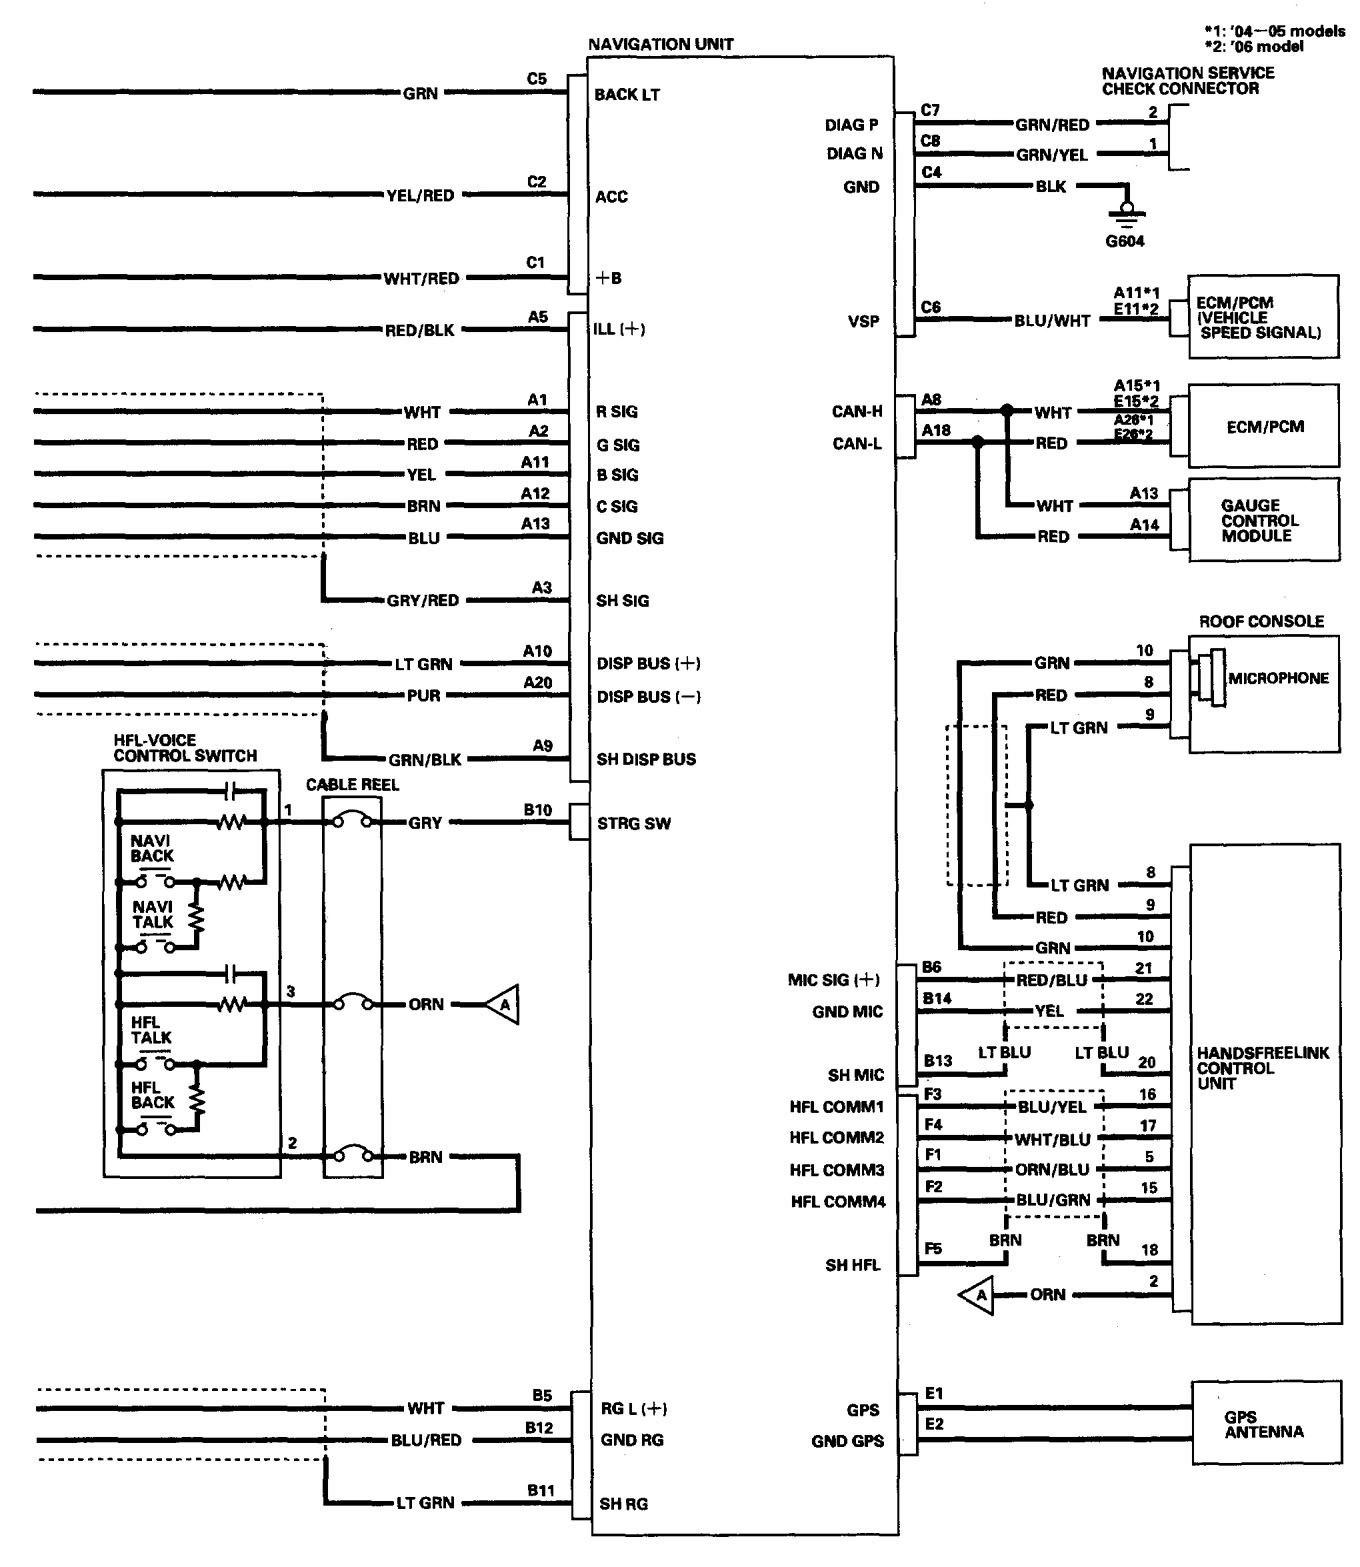 Acura El 2005 Wiring Diagram - 2008 Kia Spectra Fuse Box Location -  toshiba.ke2x.jeanjaures37.frWiring Diagram Resource